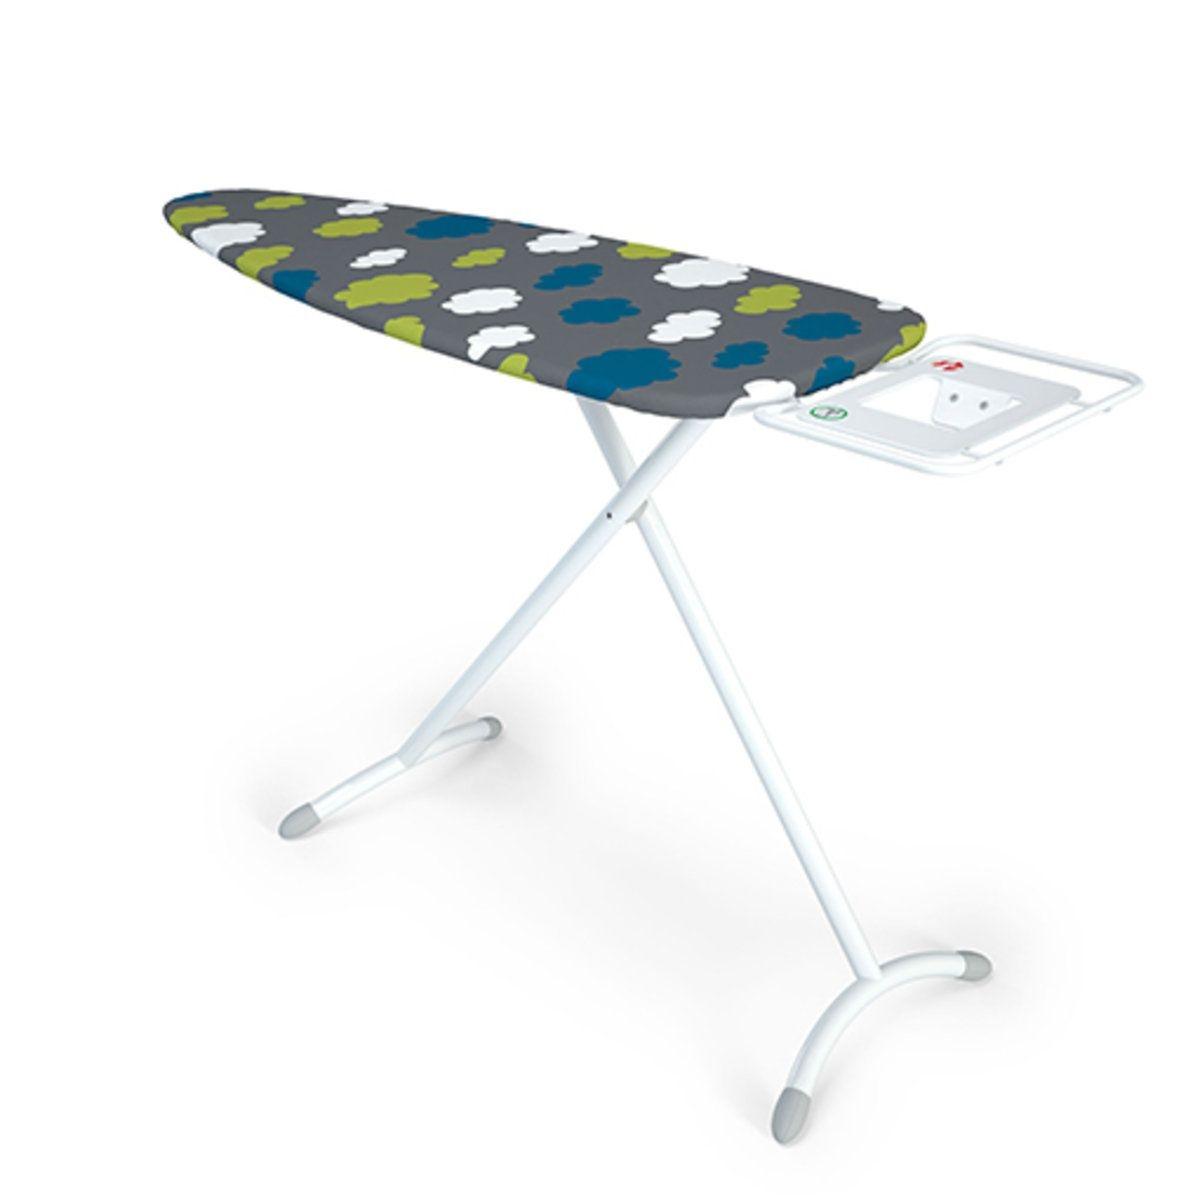 vente table repasser tritoo maison et jardin. Black Bedroom Furniture Sets. Home Design Ideas